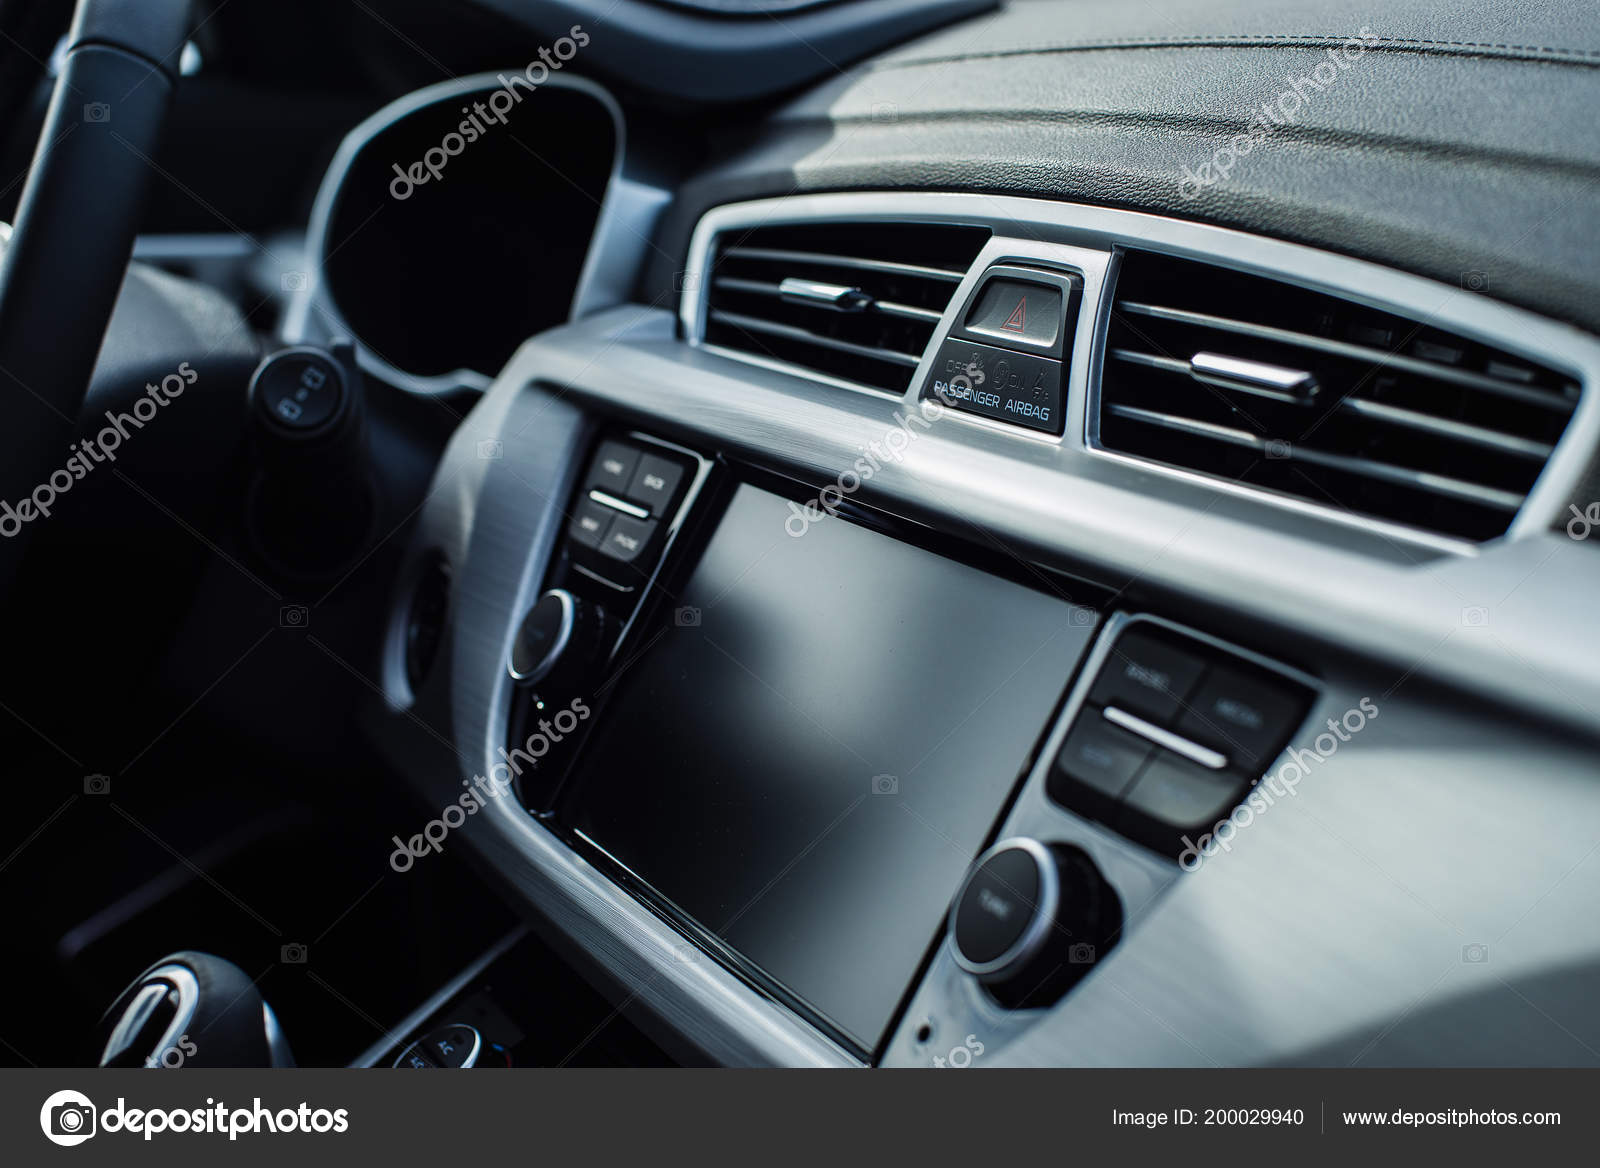 204cbd88ff Εσωτερικό αυτοκινήτου με ρηχό βάθος πεδίου με εστίαση στο κουμπί έκτακτης  διακοπής — Εικόνα από ...